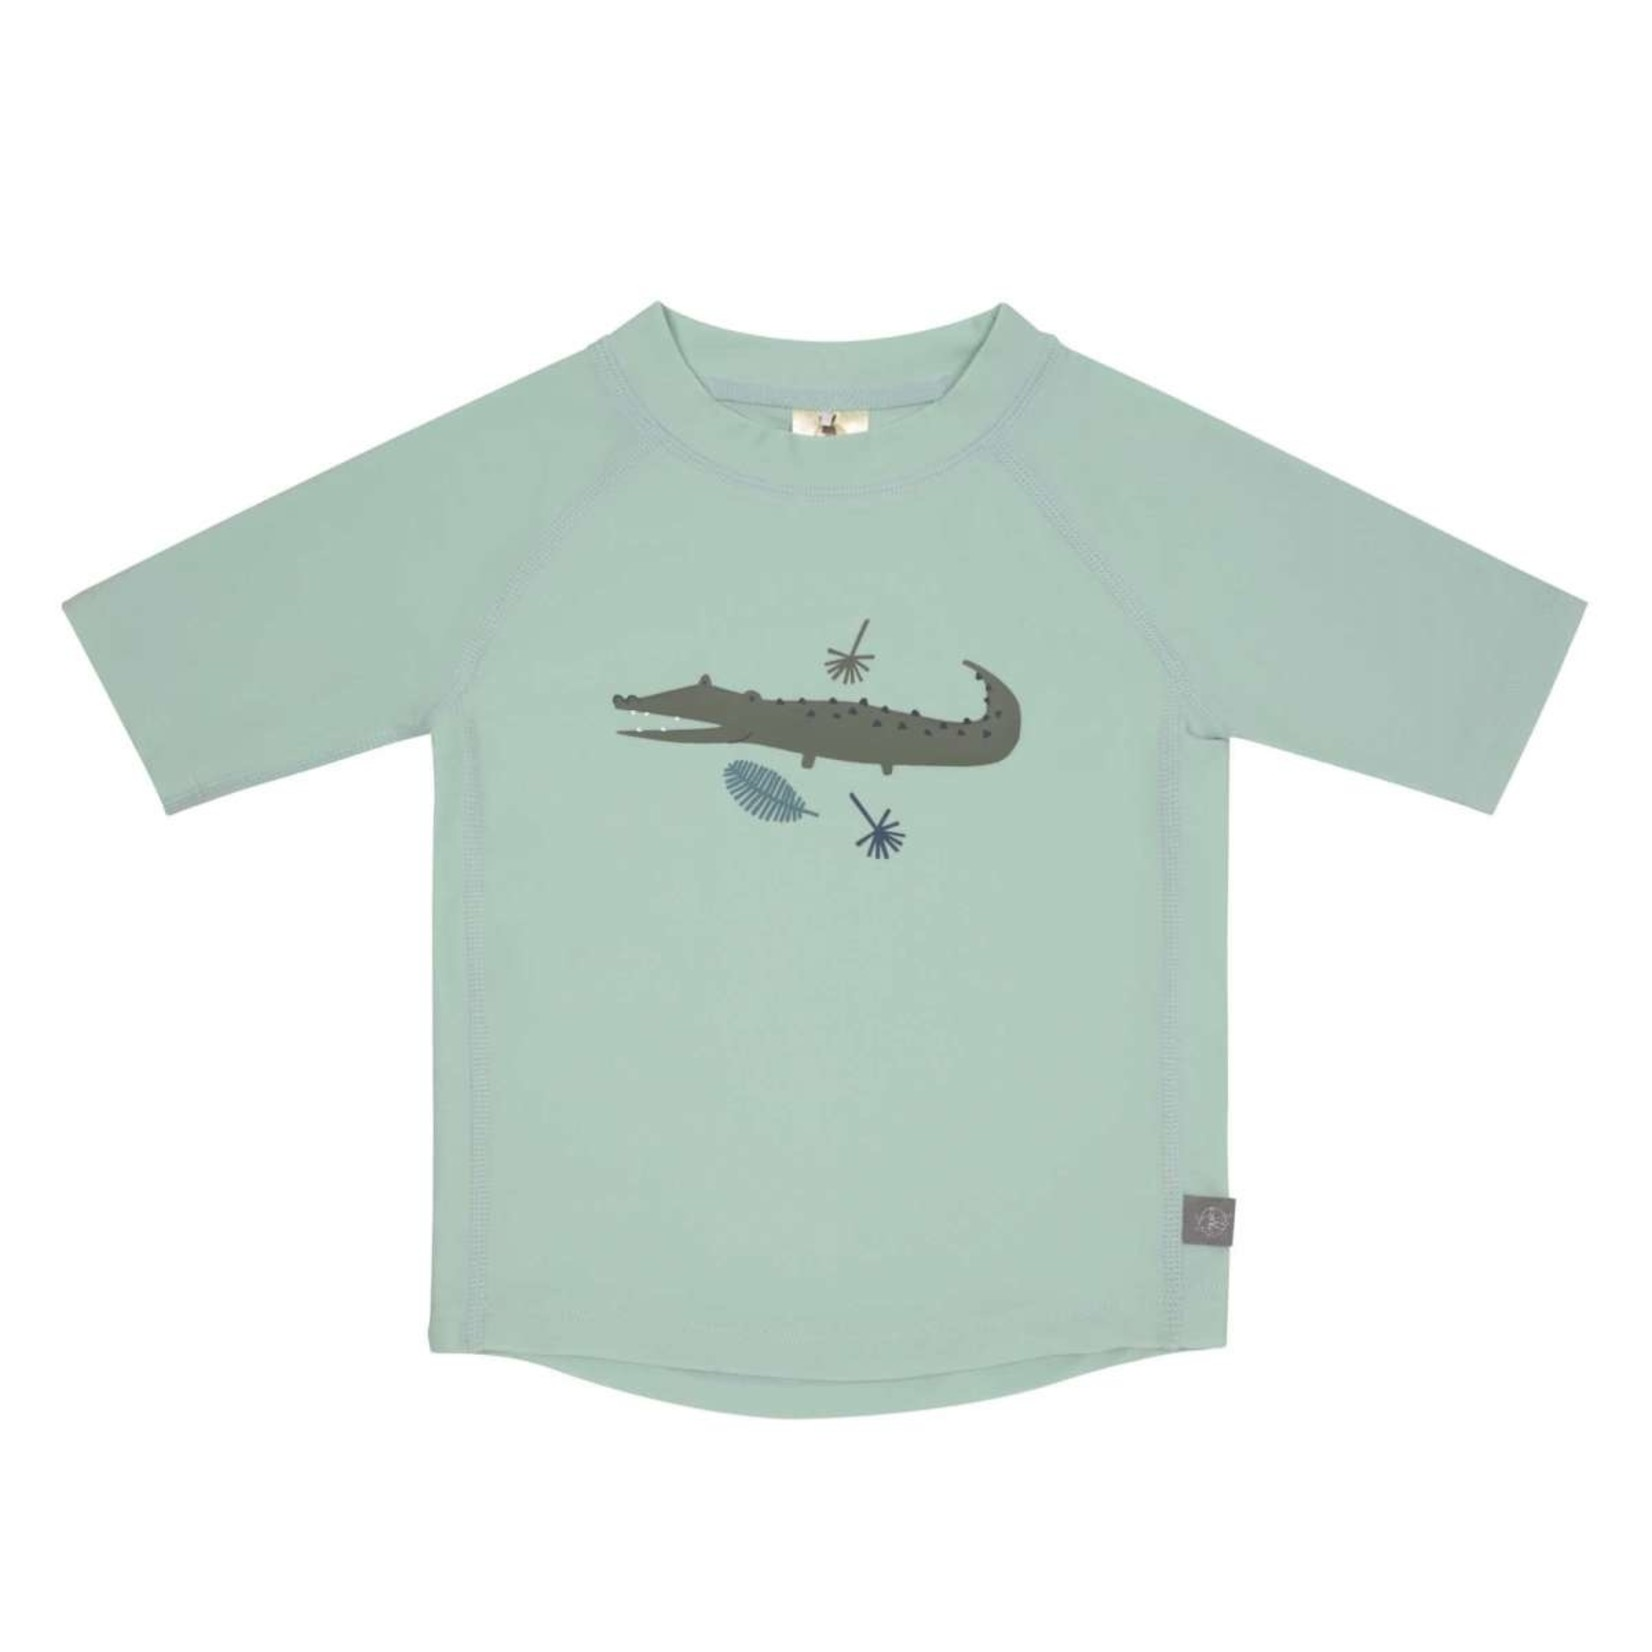 Lässig Lässig Zwem T-shirt Crocodile Mint